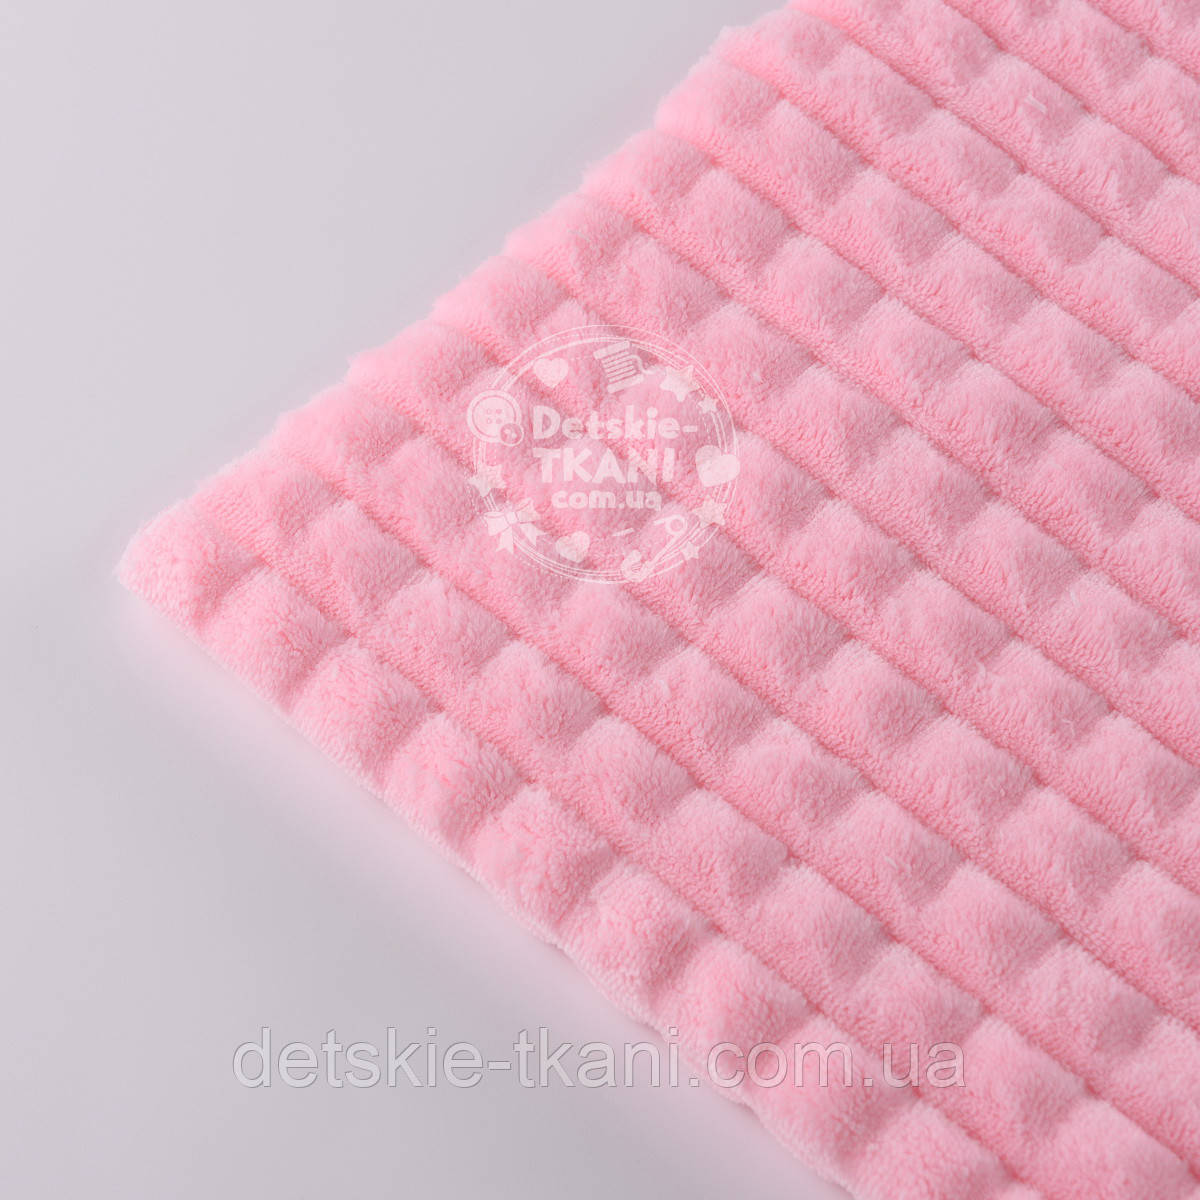 "Лоскут плюша ""Пирамидки"", розового цвета (М-007), размер 150*65 см"